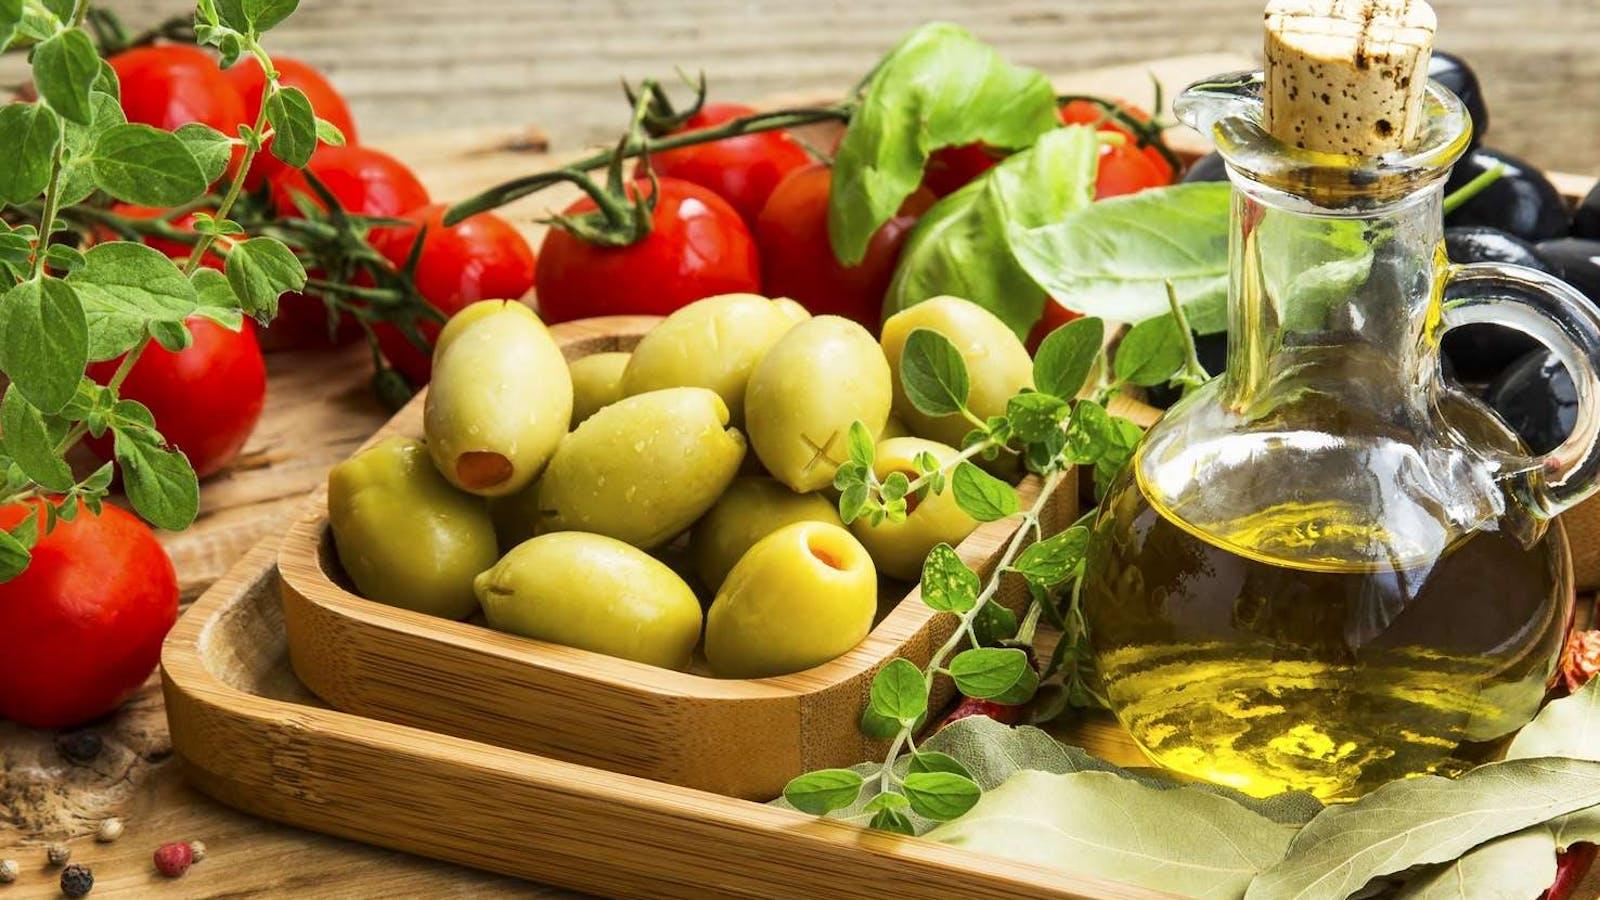 Why follow the Mediterranean diet?